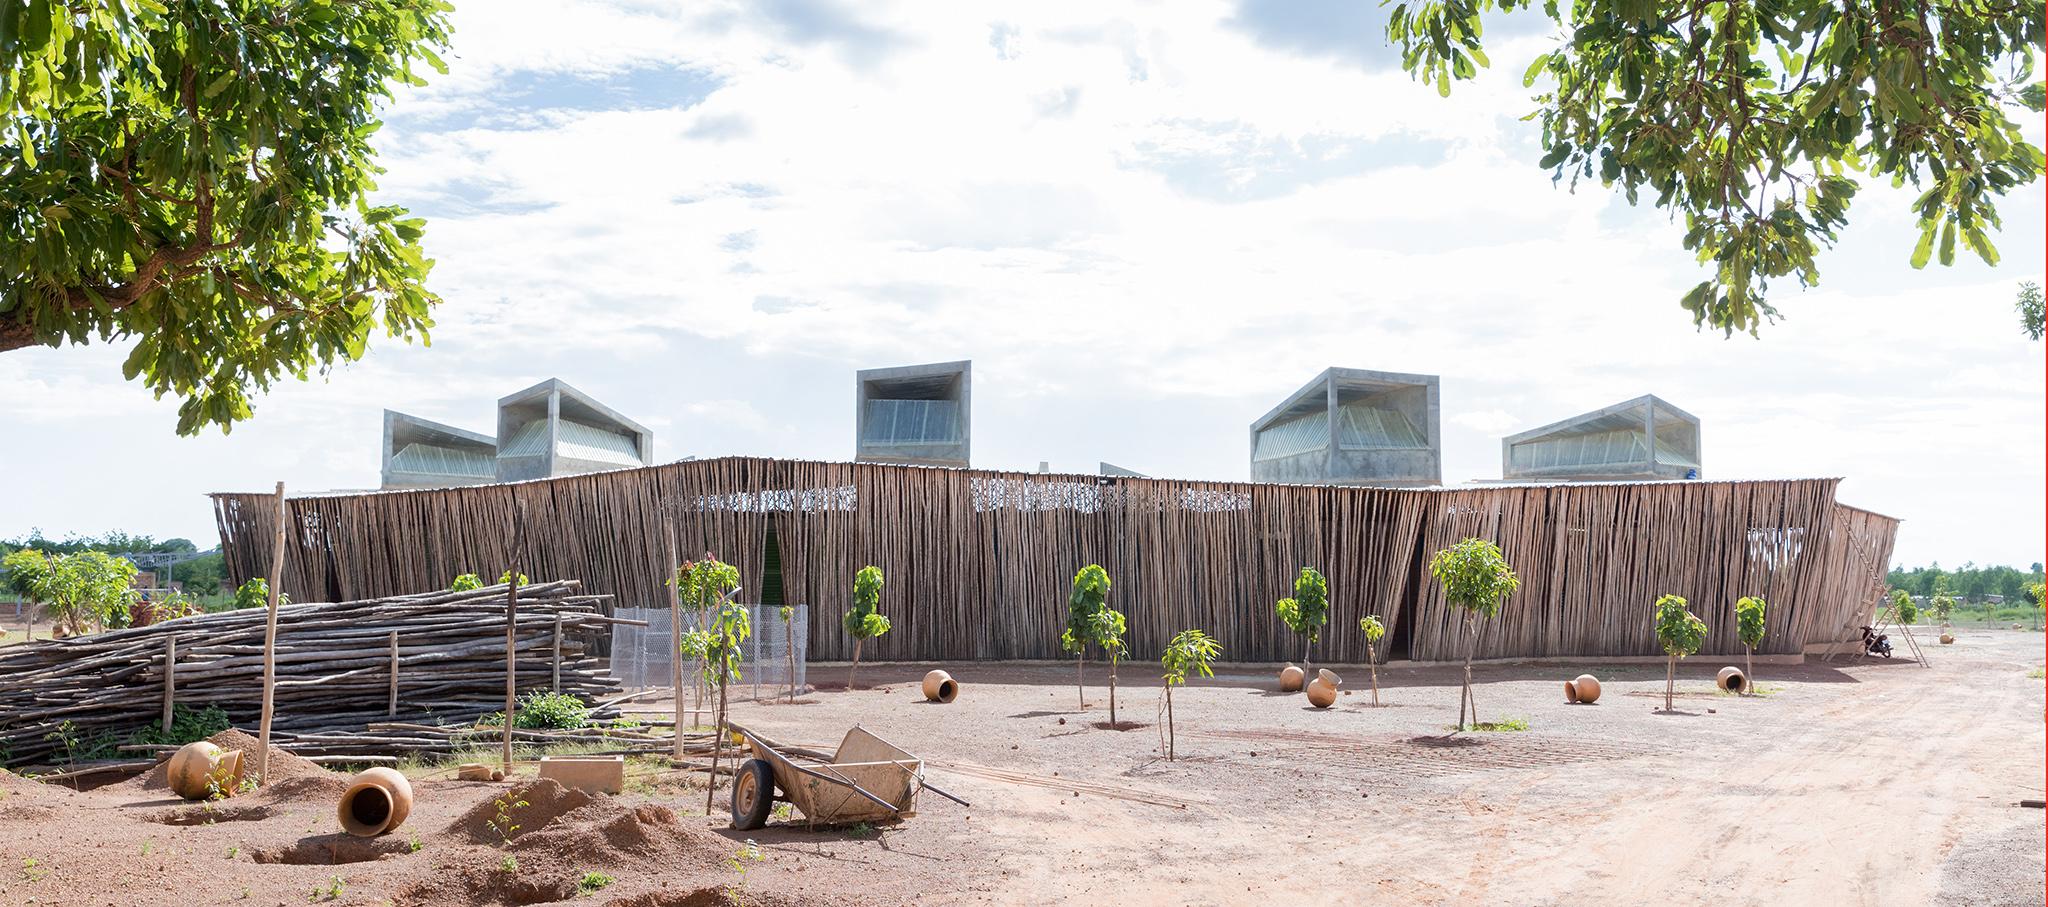 Escuela secundaria Lycée Schorge por Kéré Architecture. Fotografía por Iwan Baan